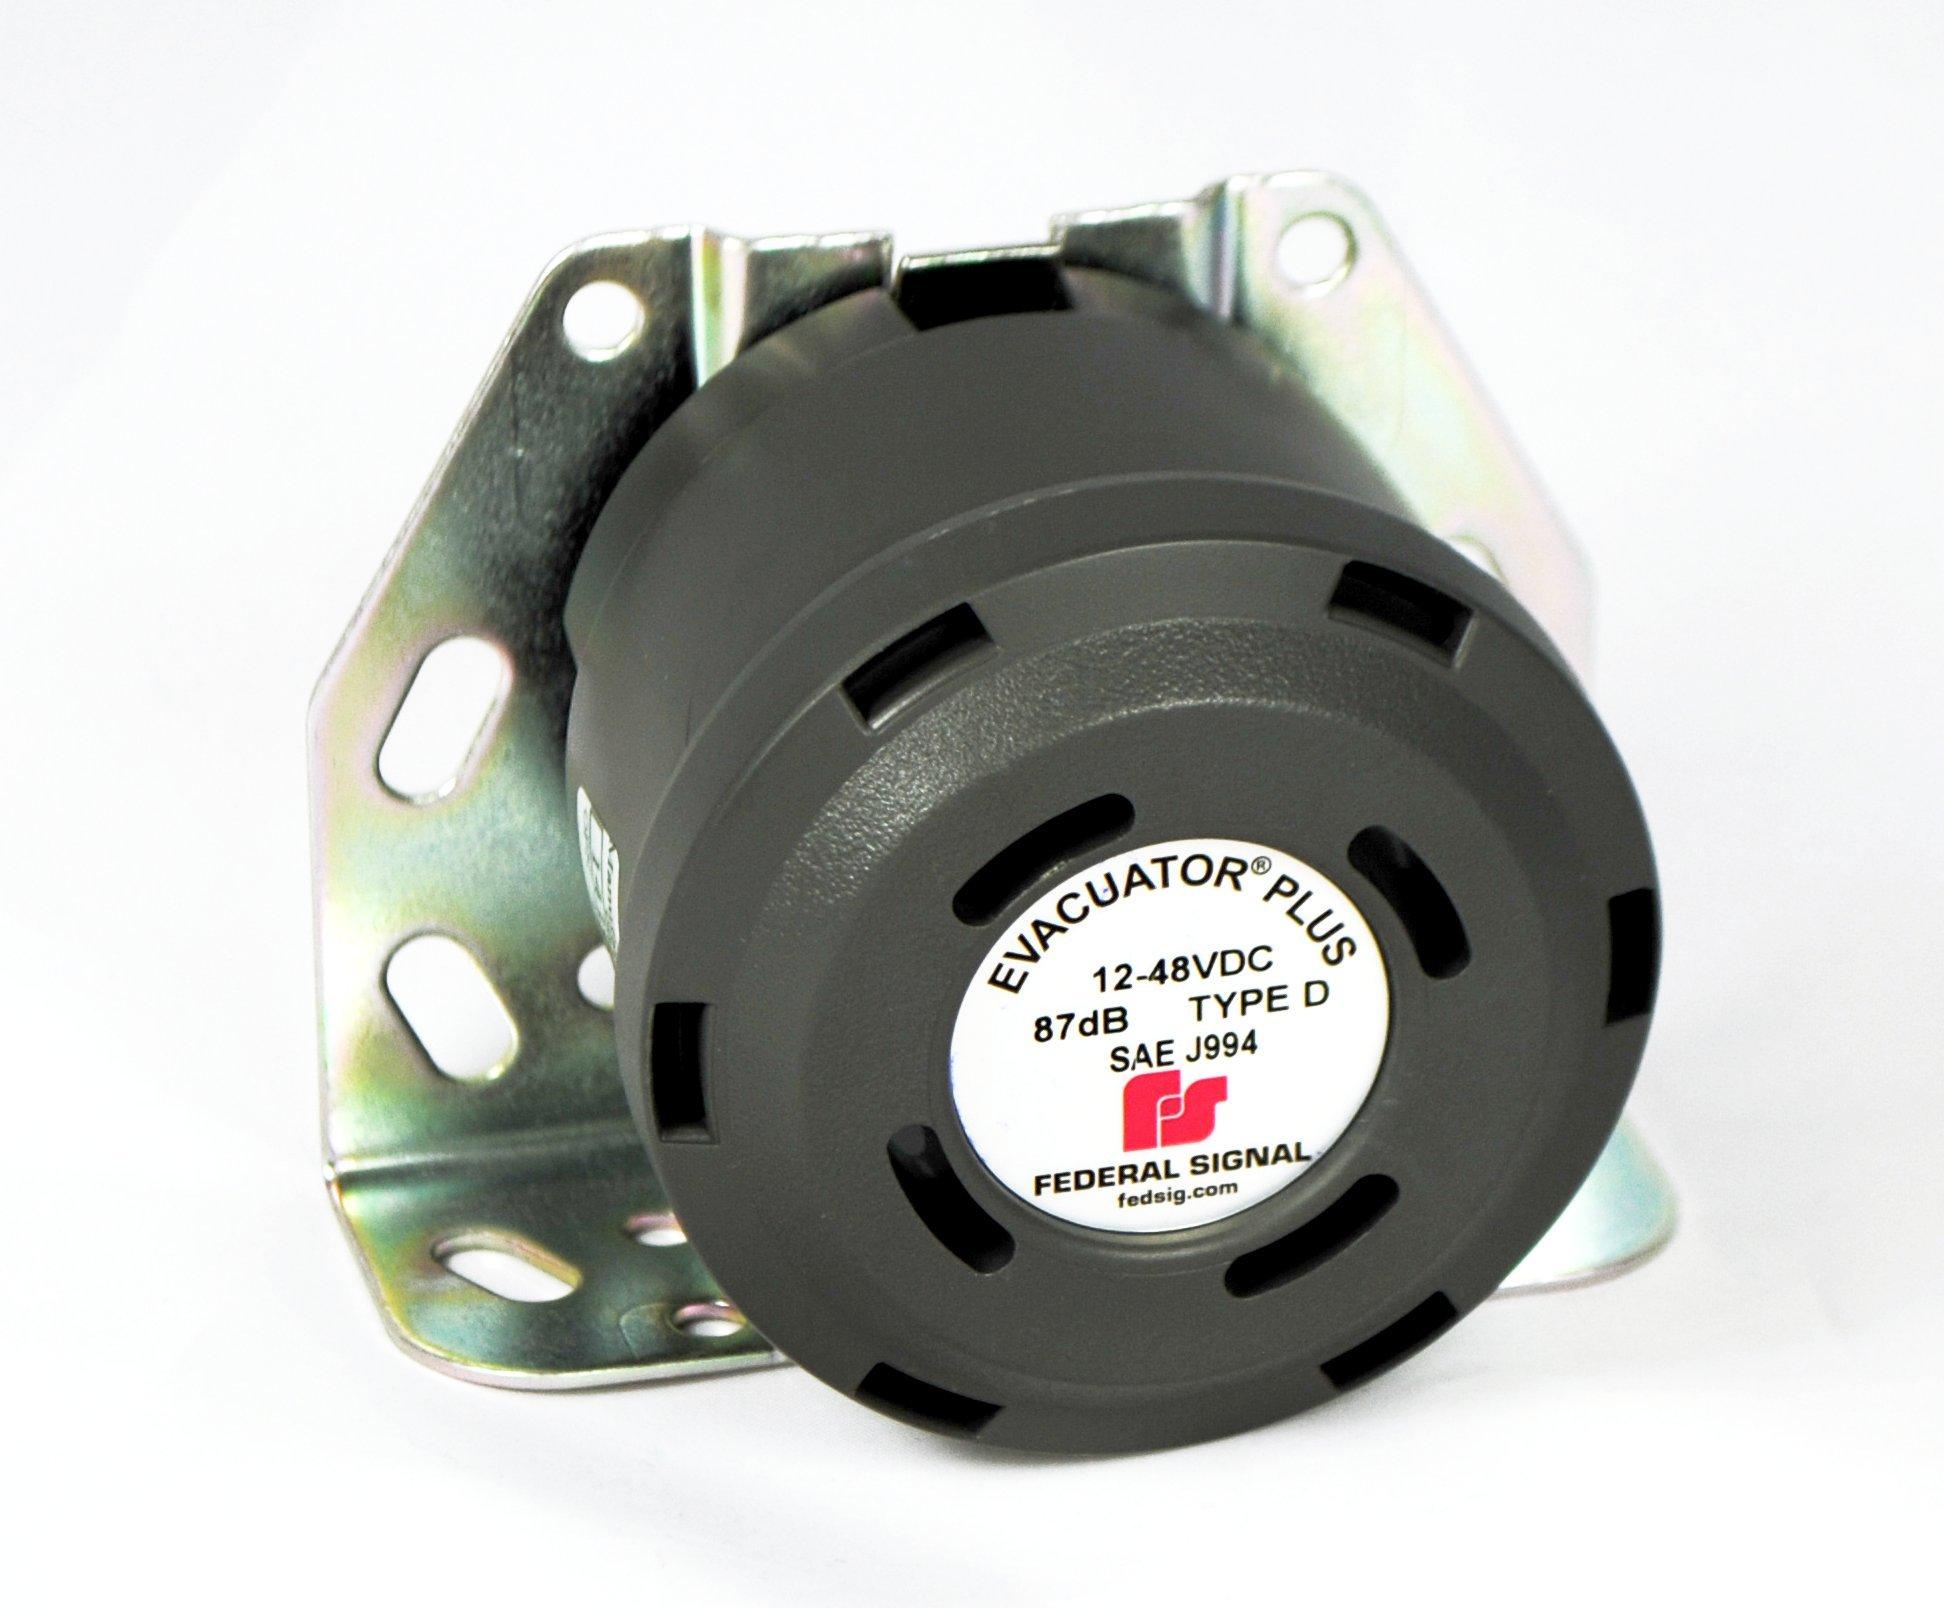 Federal Signal 210330SSG Evacuator Back-Up Alarm, Dual Tone Universal Mounting Bracket, 87 dB(A)